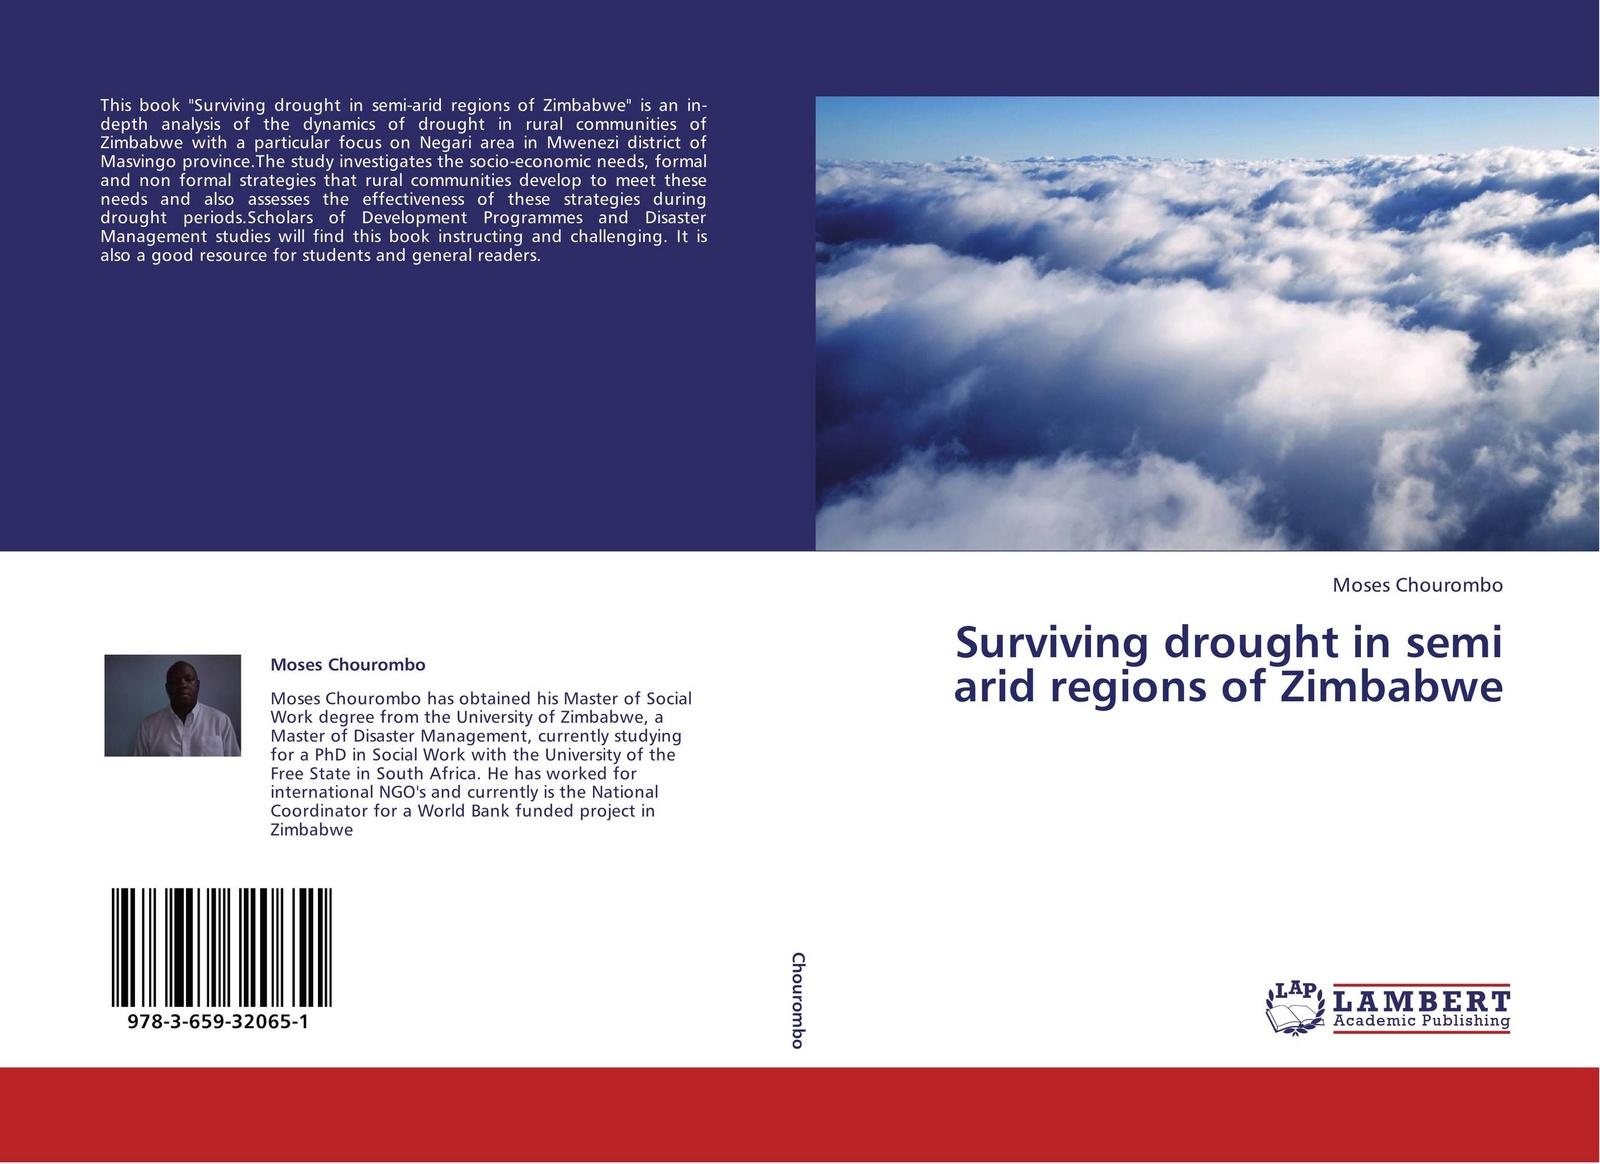 Moses Chourombo Surviving drought in semi arid regions of Zimbabwe цена в Москве и Питере